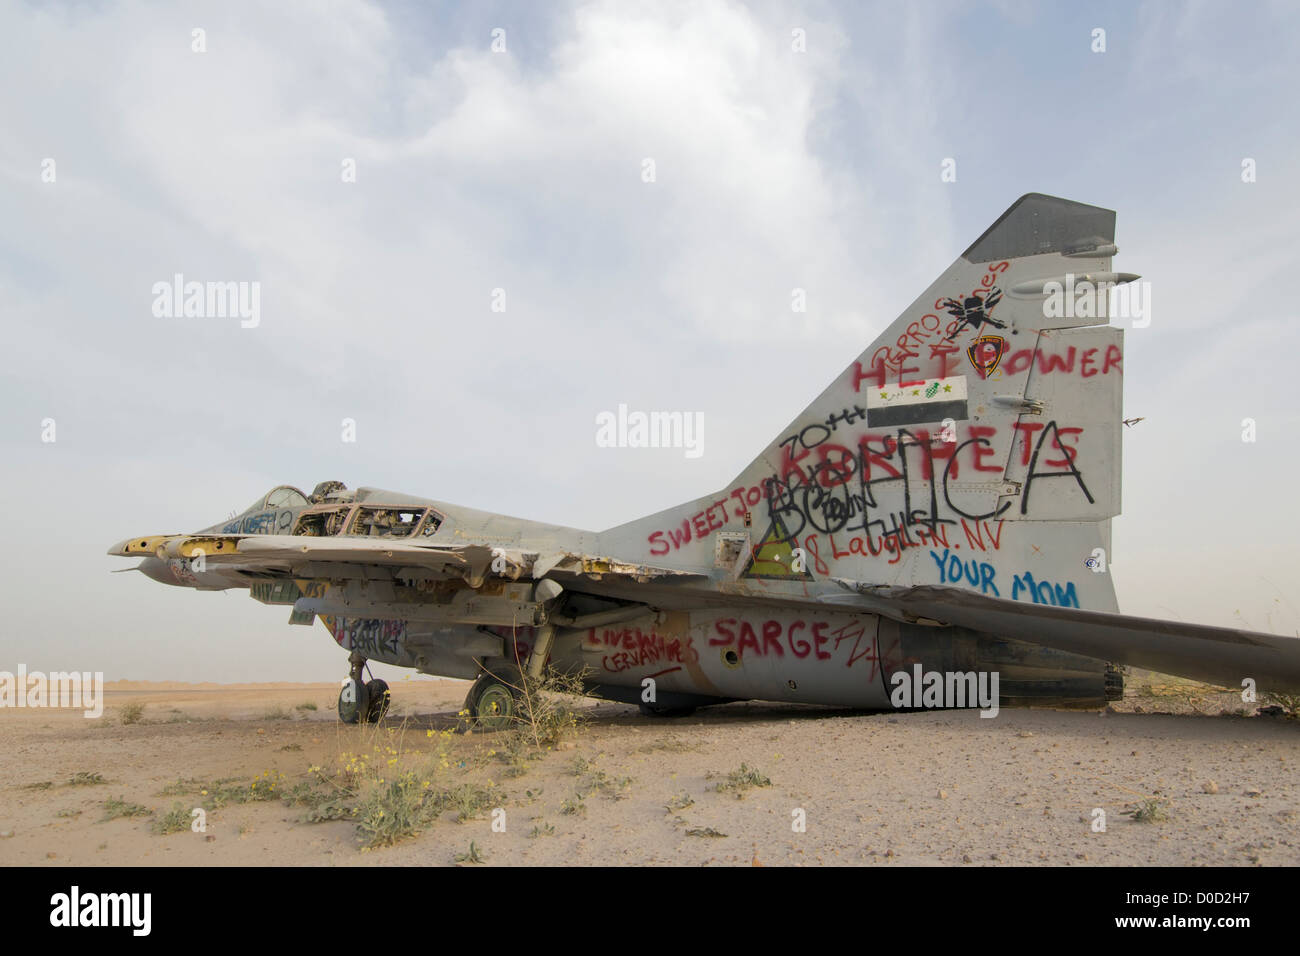 Destroyed Sukhoi SU-27 Flanker at Al Taqaddum Air Base in Iraq's Al Anbar Province - Stock Image